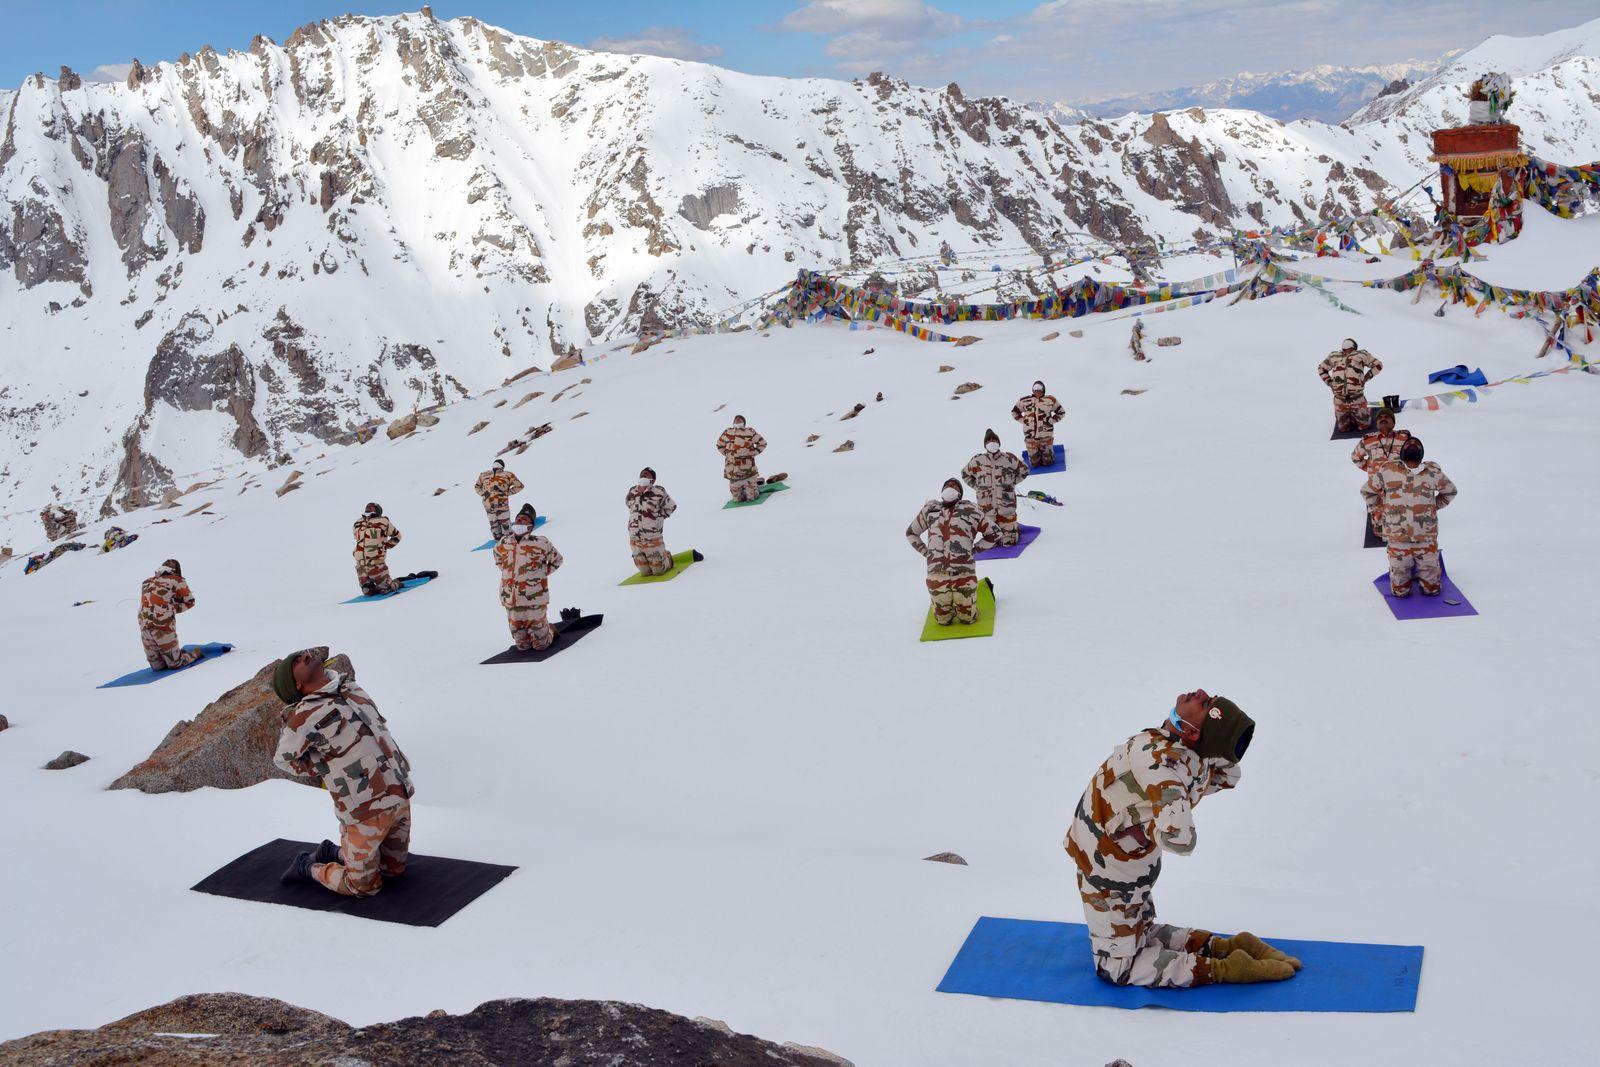 ITBP Force personnel perform Yoga in Ladakh, India - 21 Jun 2020